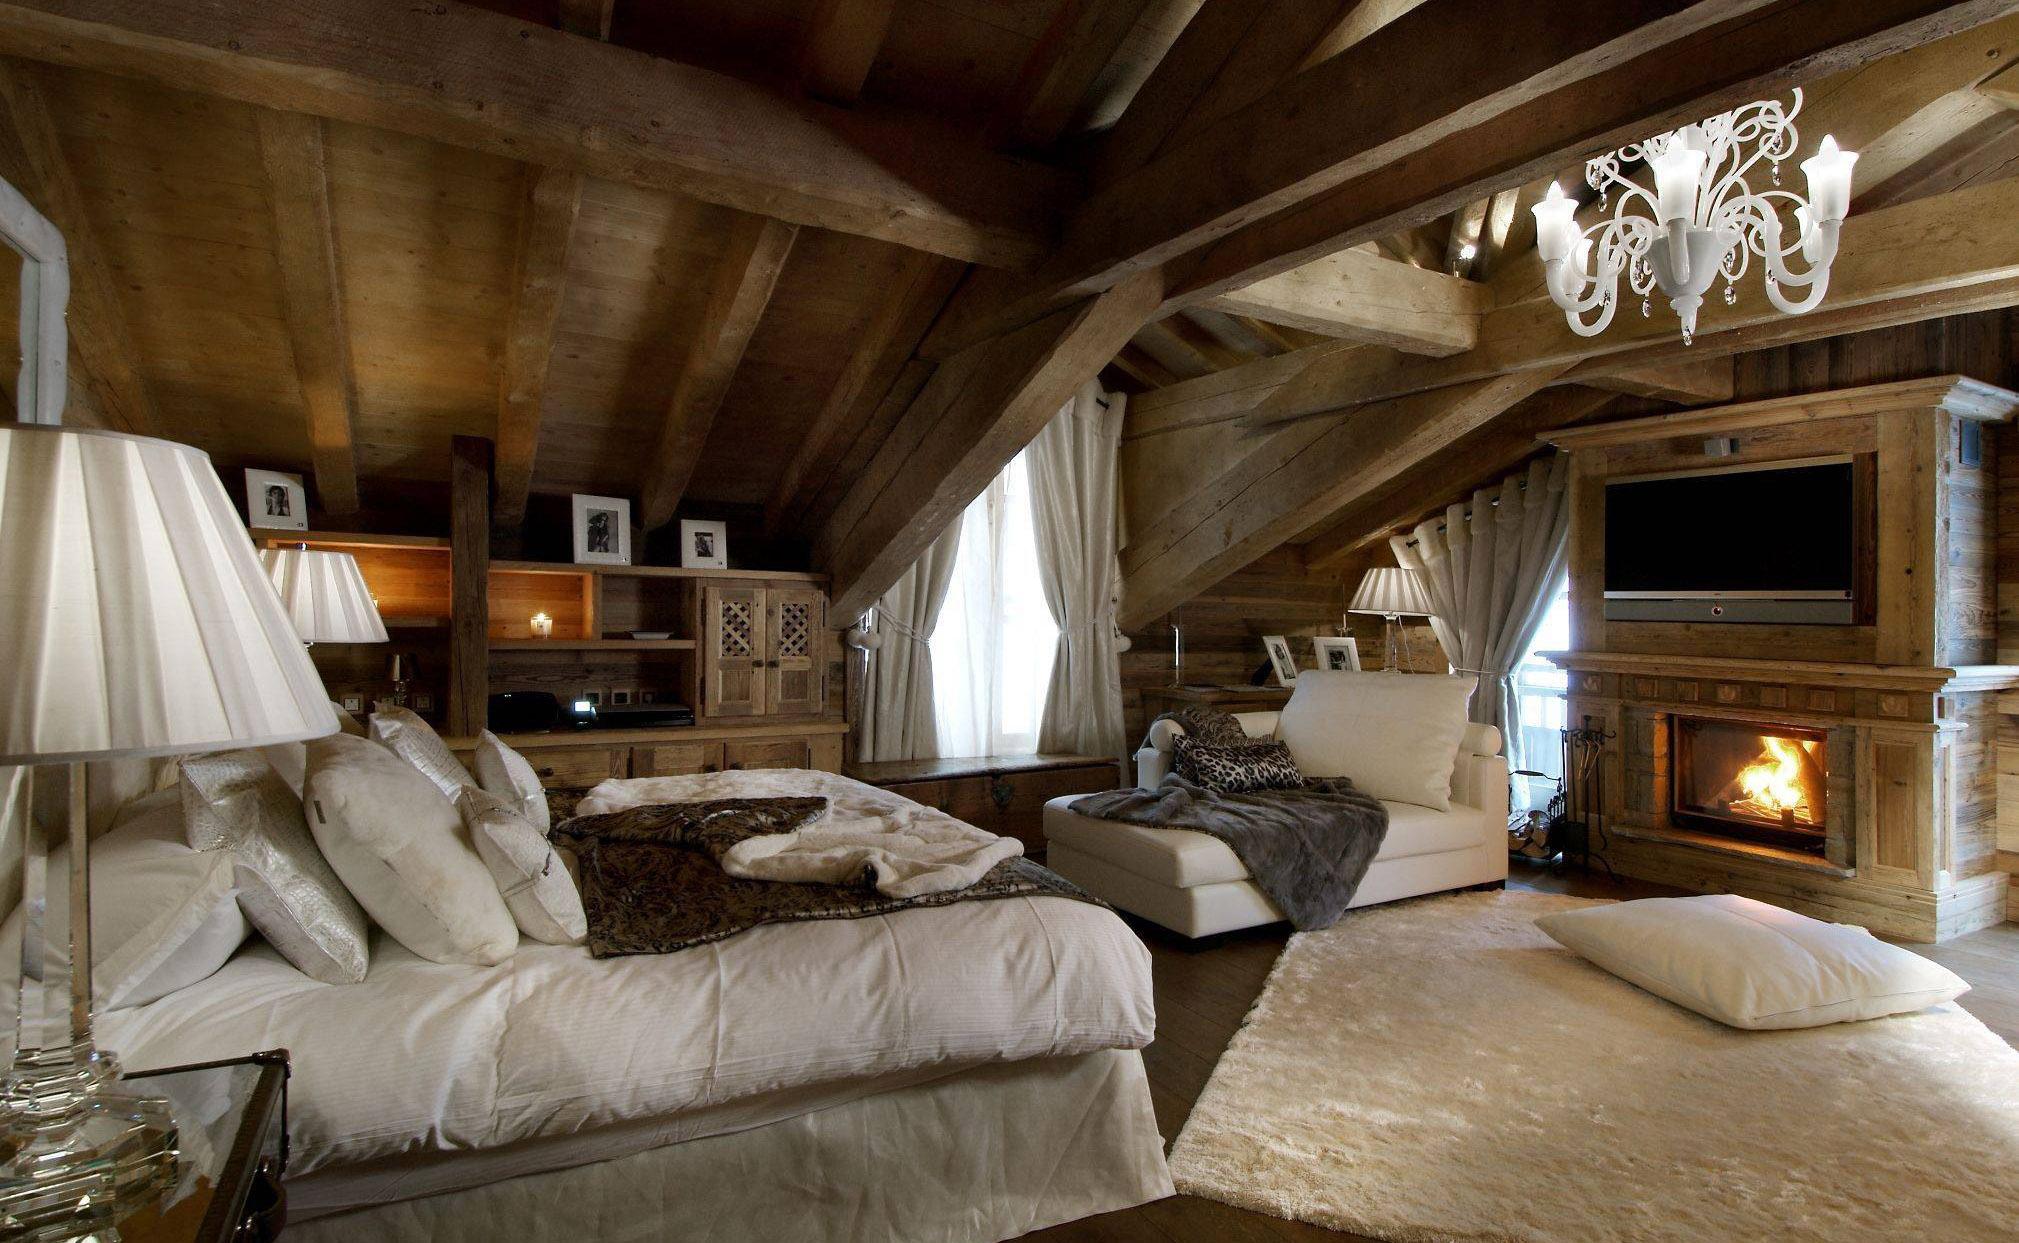 Lovelydays luxury service apartment rental - Courchevel - Great Roc Chalet - Partner - 7 bedrooms - 6 bathrooms - King bed - a4dc1295f89c - Lovelydays